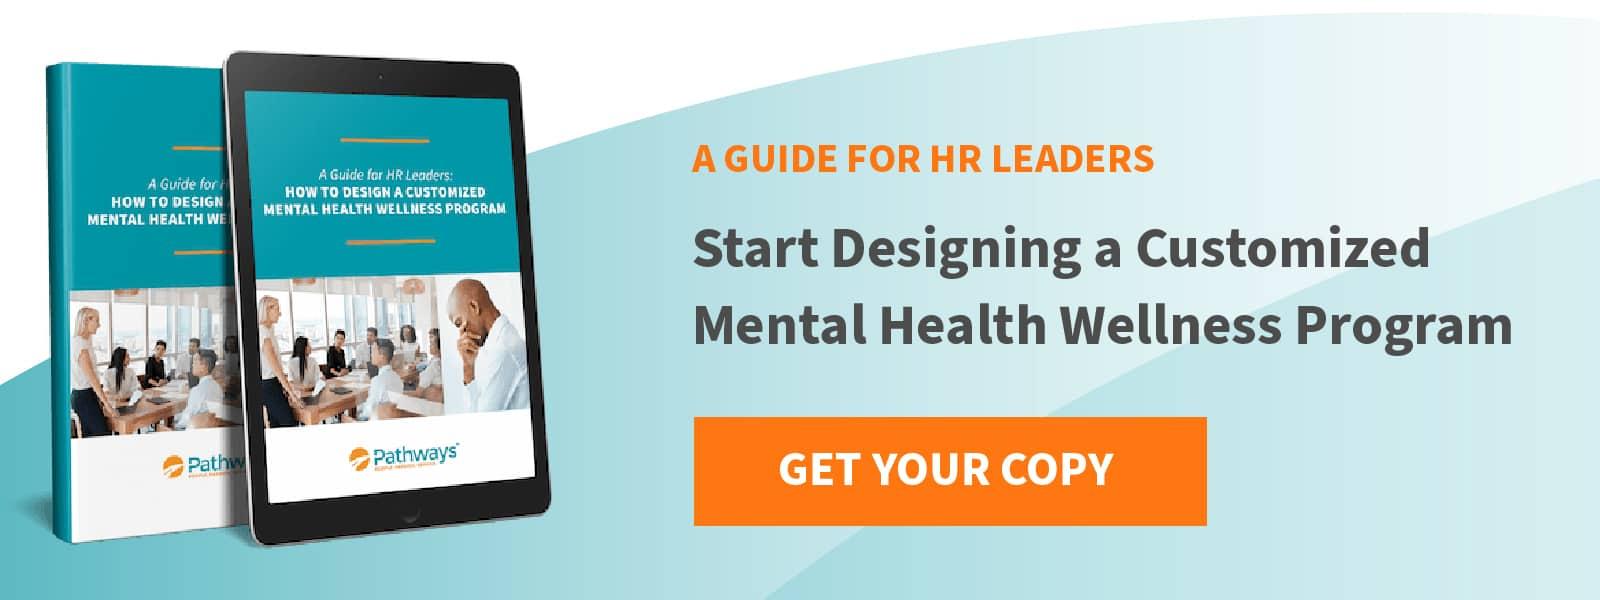 Guide-for-HR-Leaders-Designing-A-Mental-Health-Wellness-Program